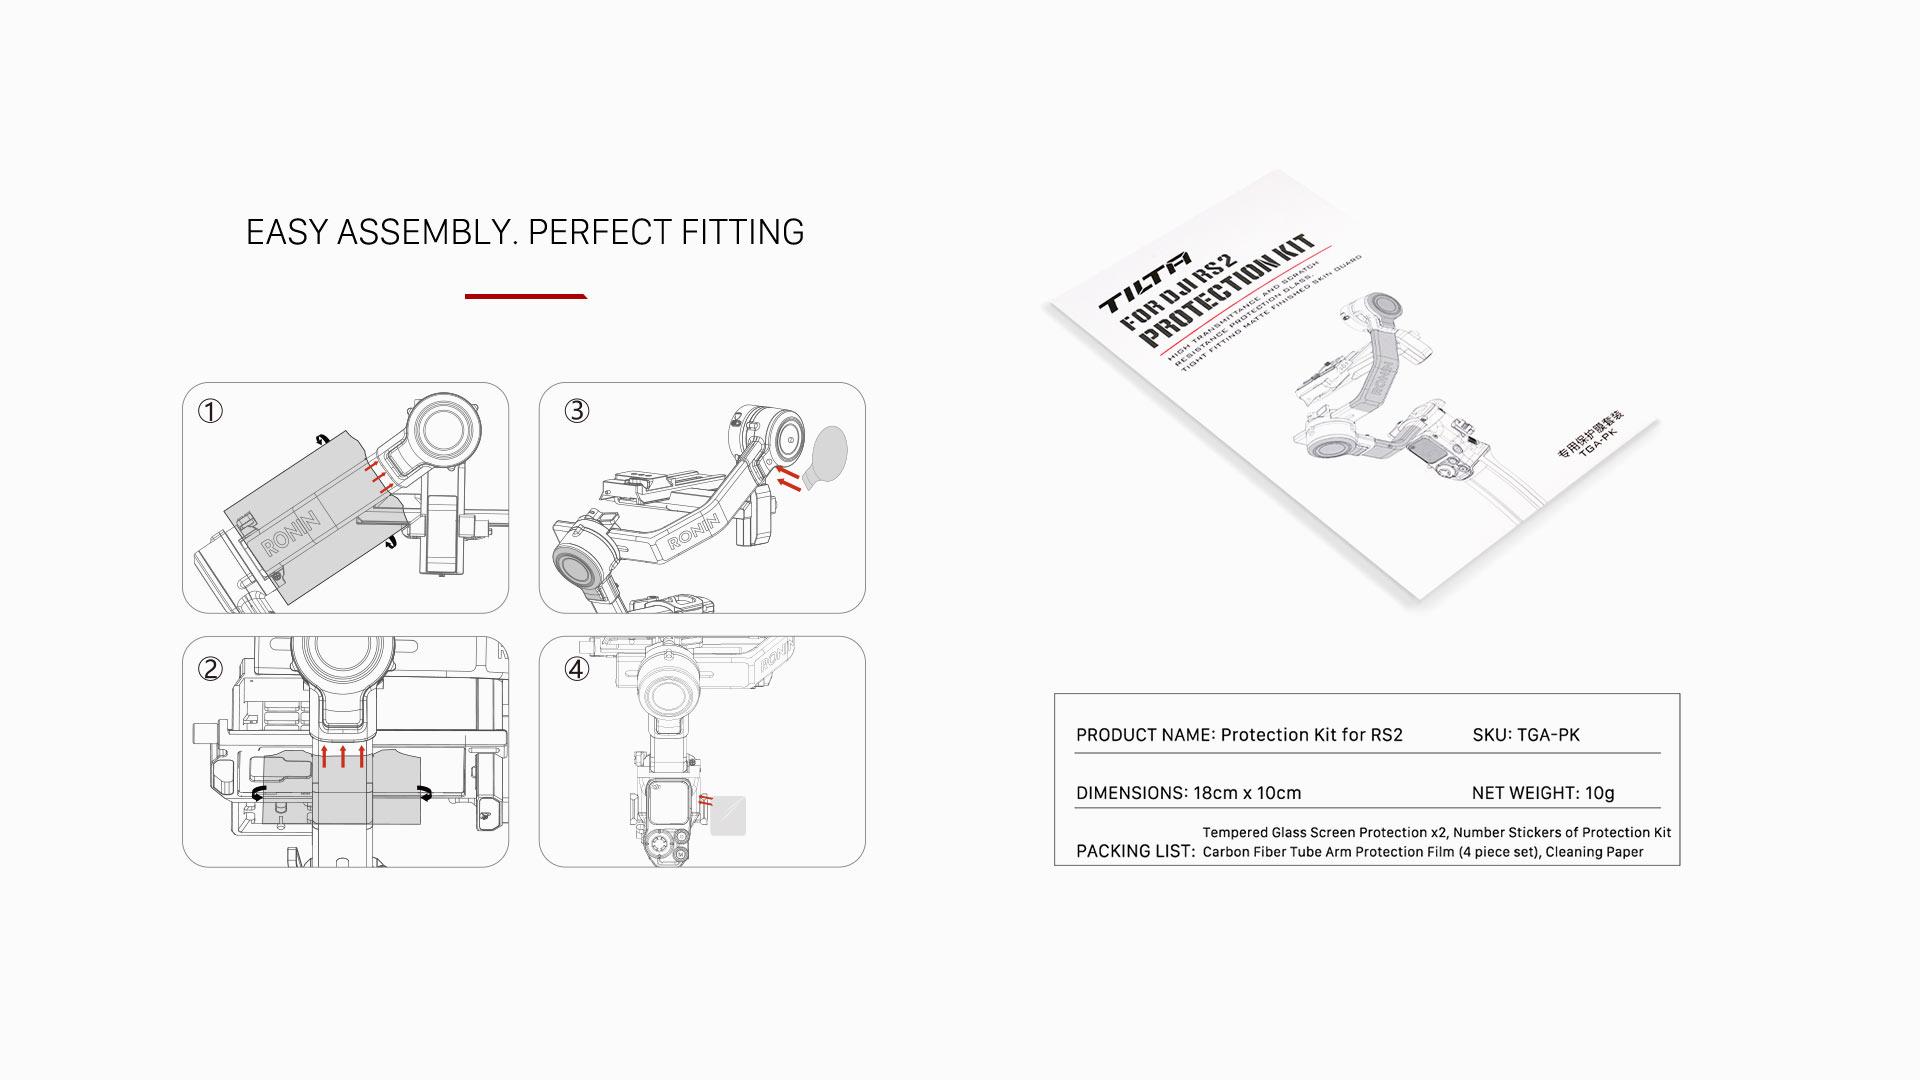 TGA-PK specs & assembly